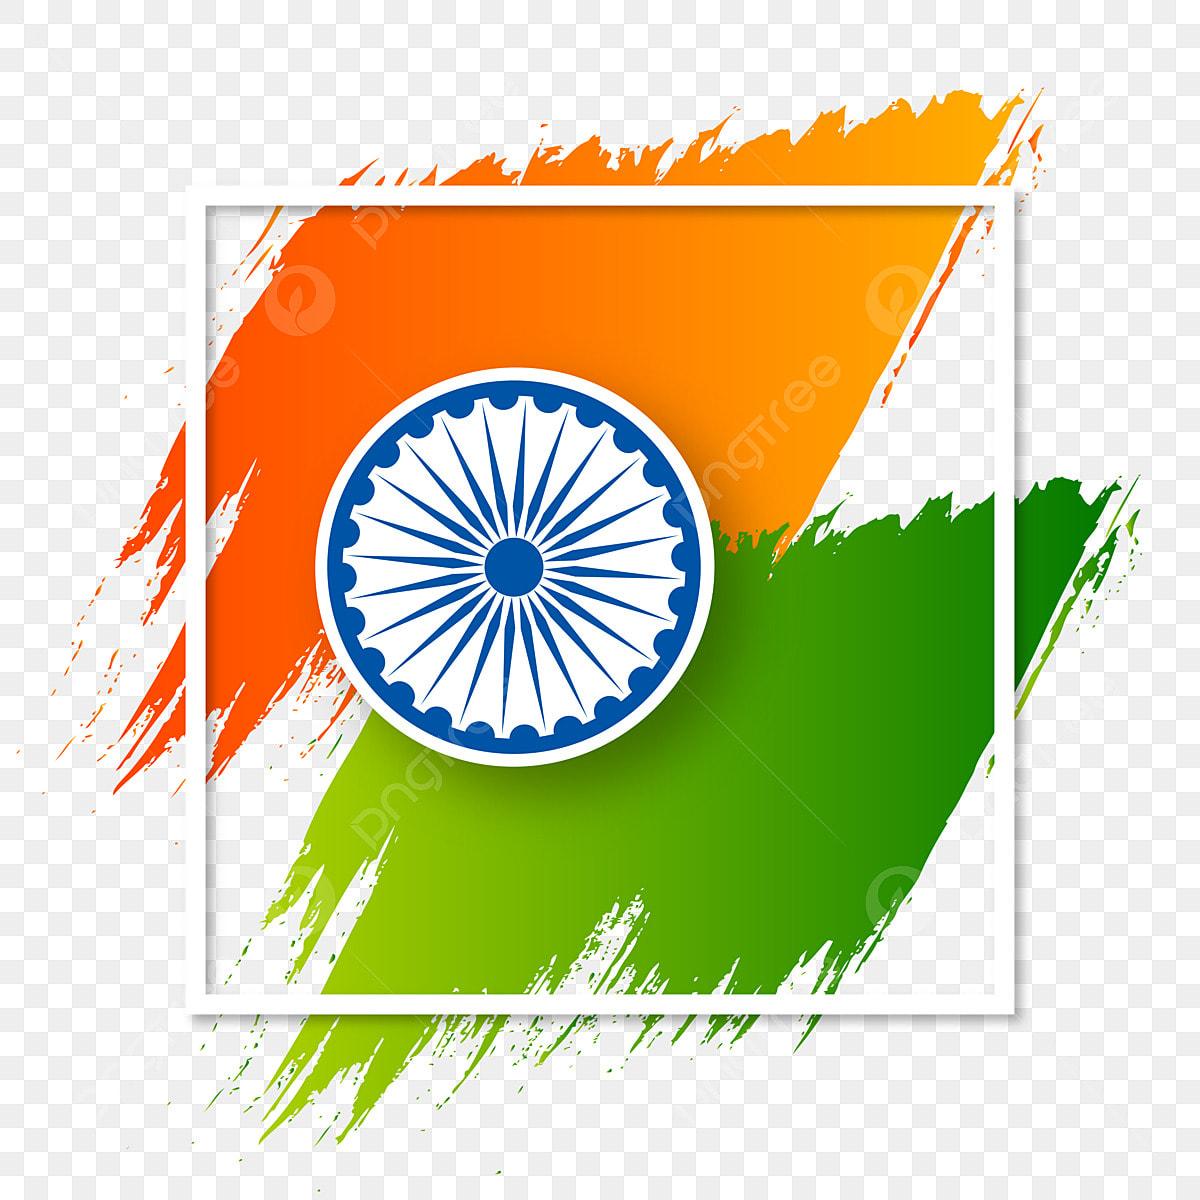 Indian Tricolor Brush Stroke Republic Day Square Frame